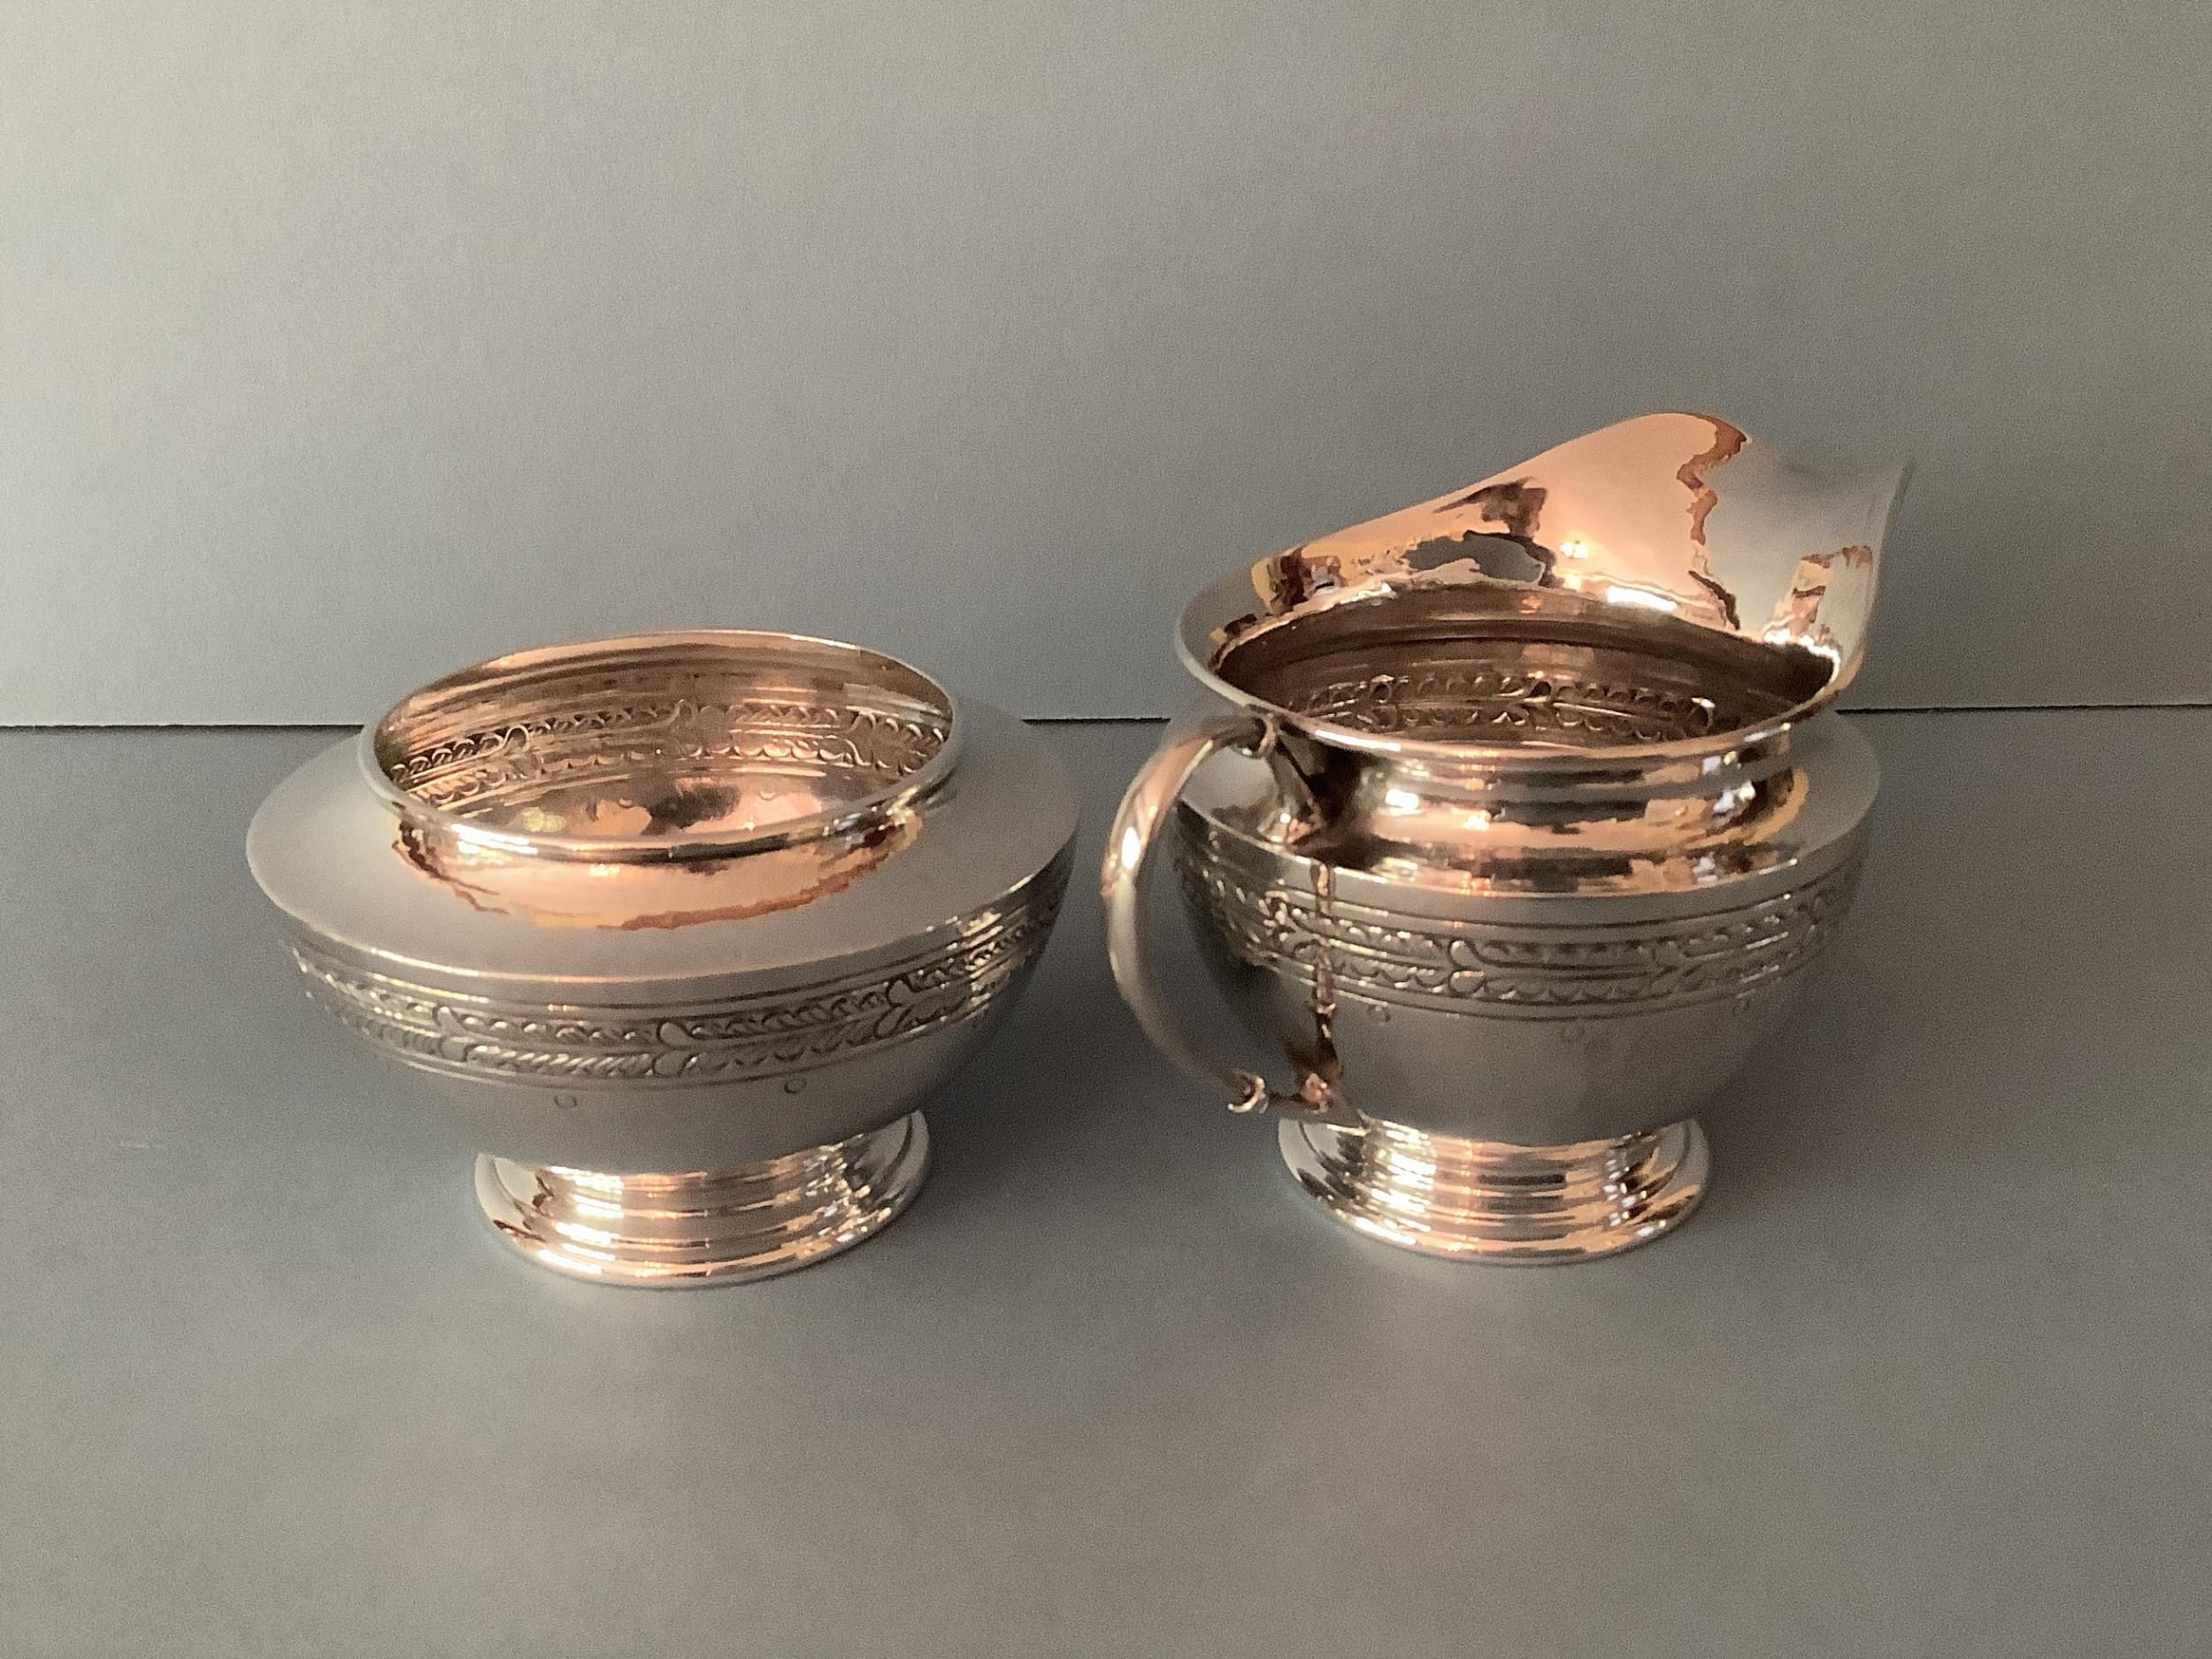 antique silver liberty milk jug and sugar bowl